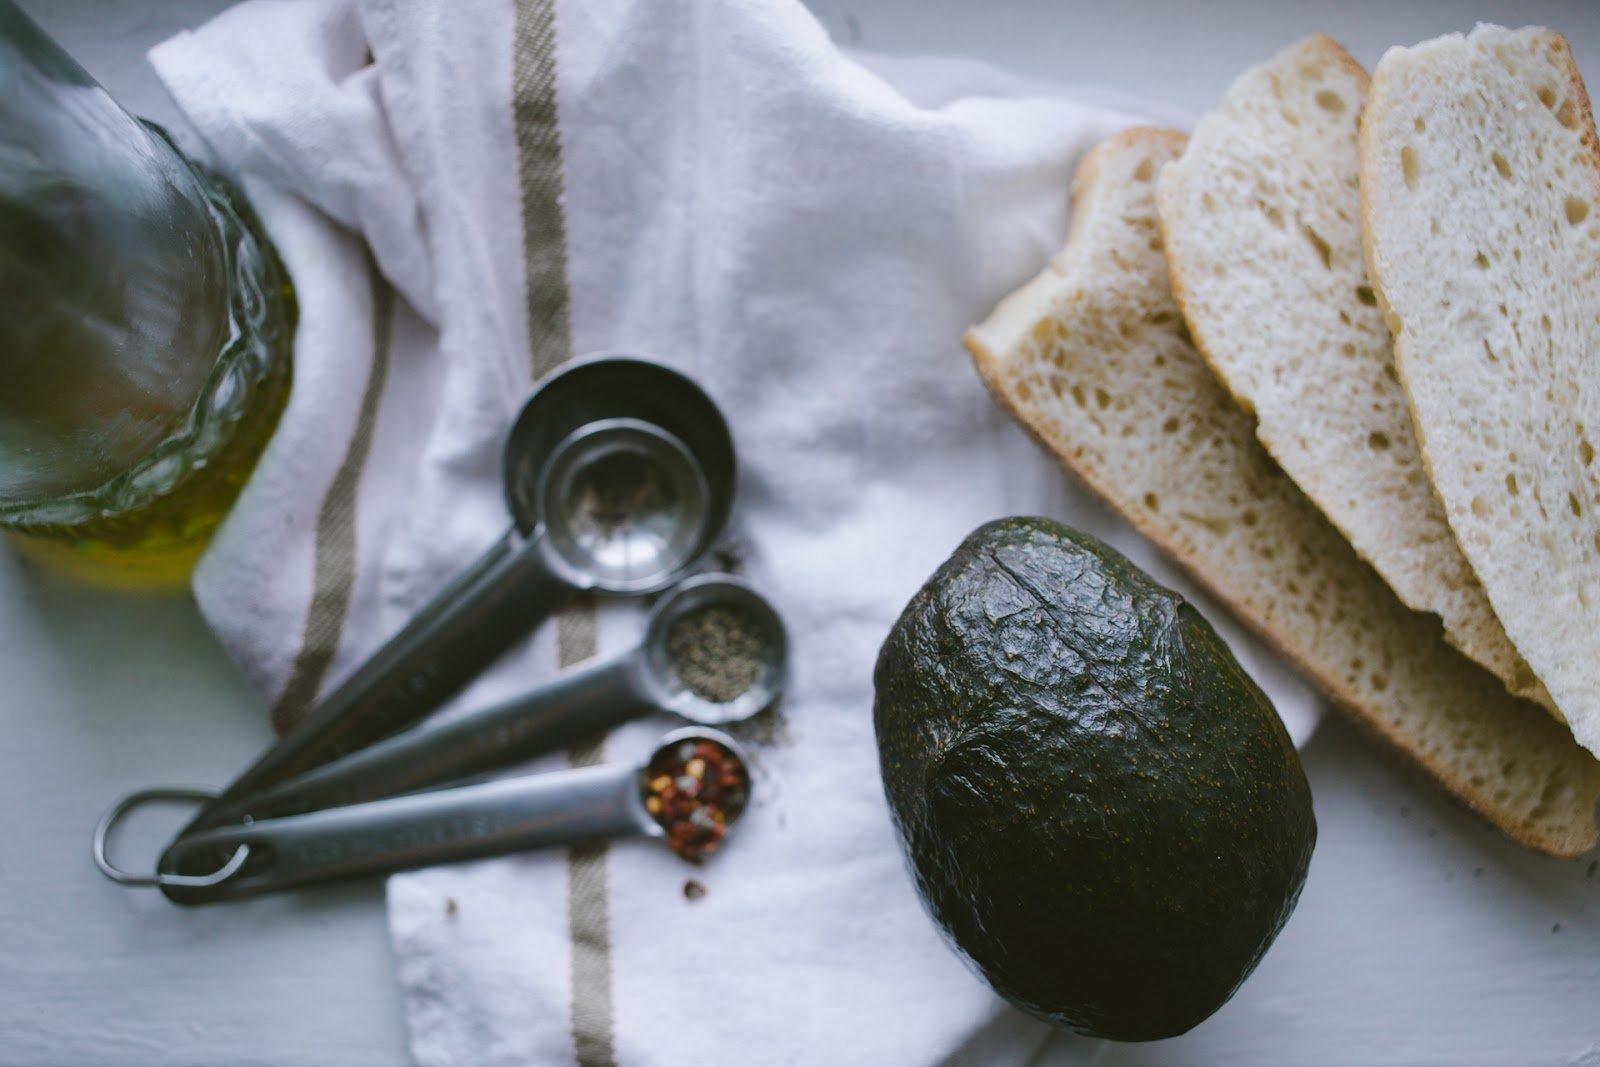 On the Table: Avocado Toast